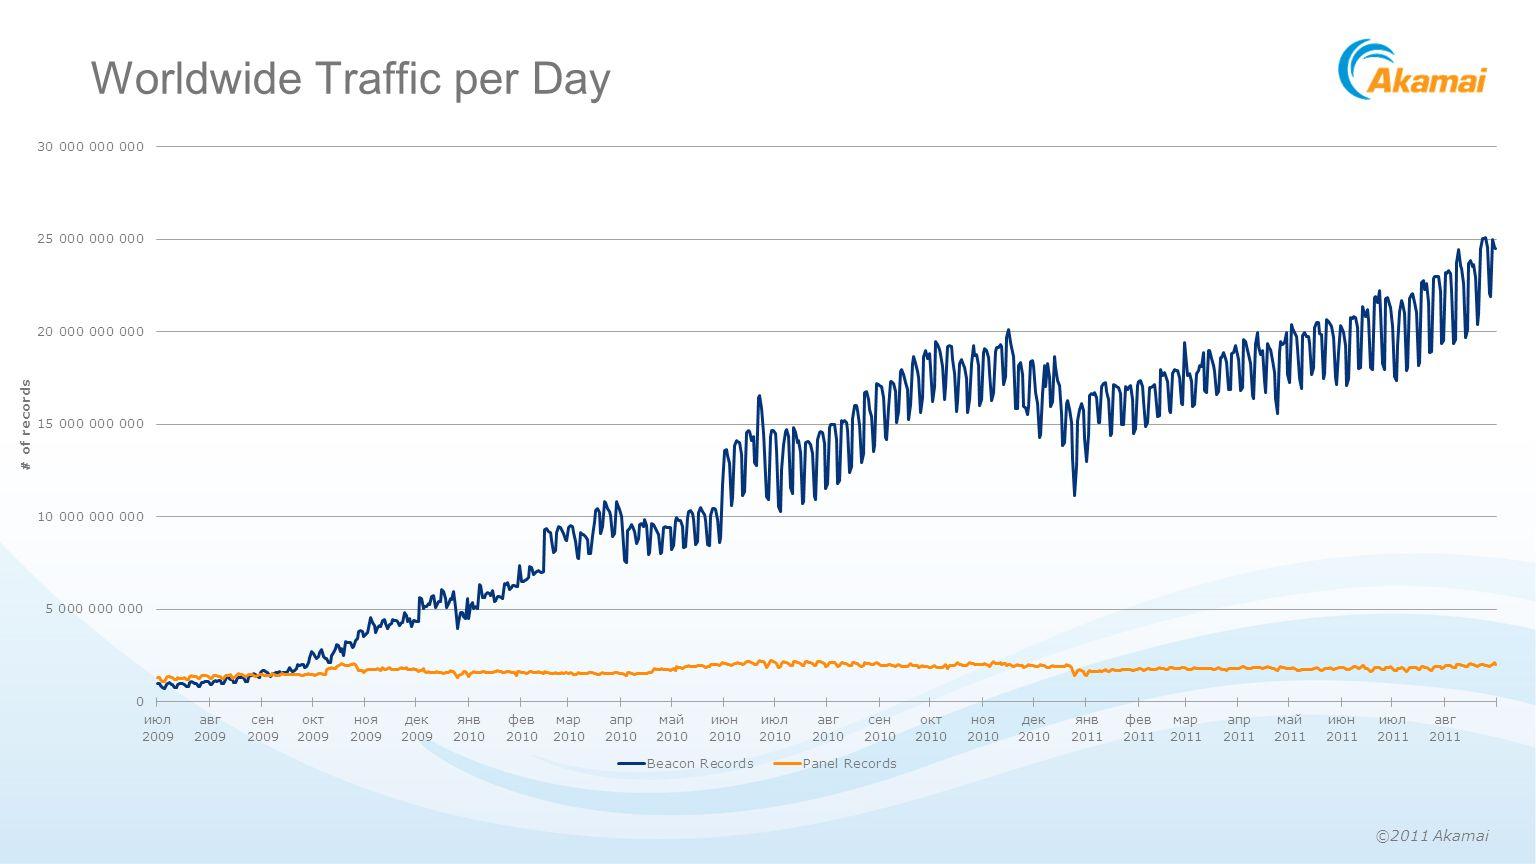 ©2011 Akamai Worldwide Traffic per Day